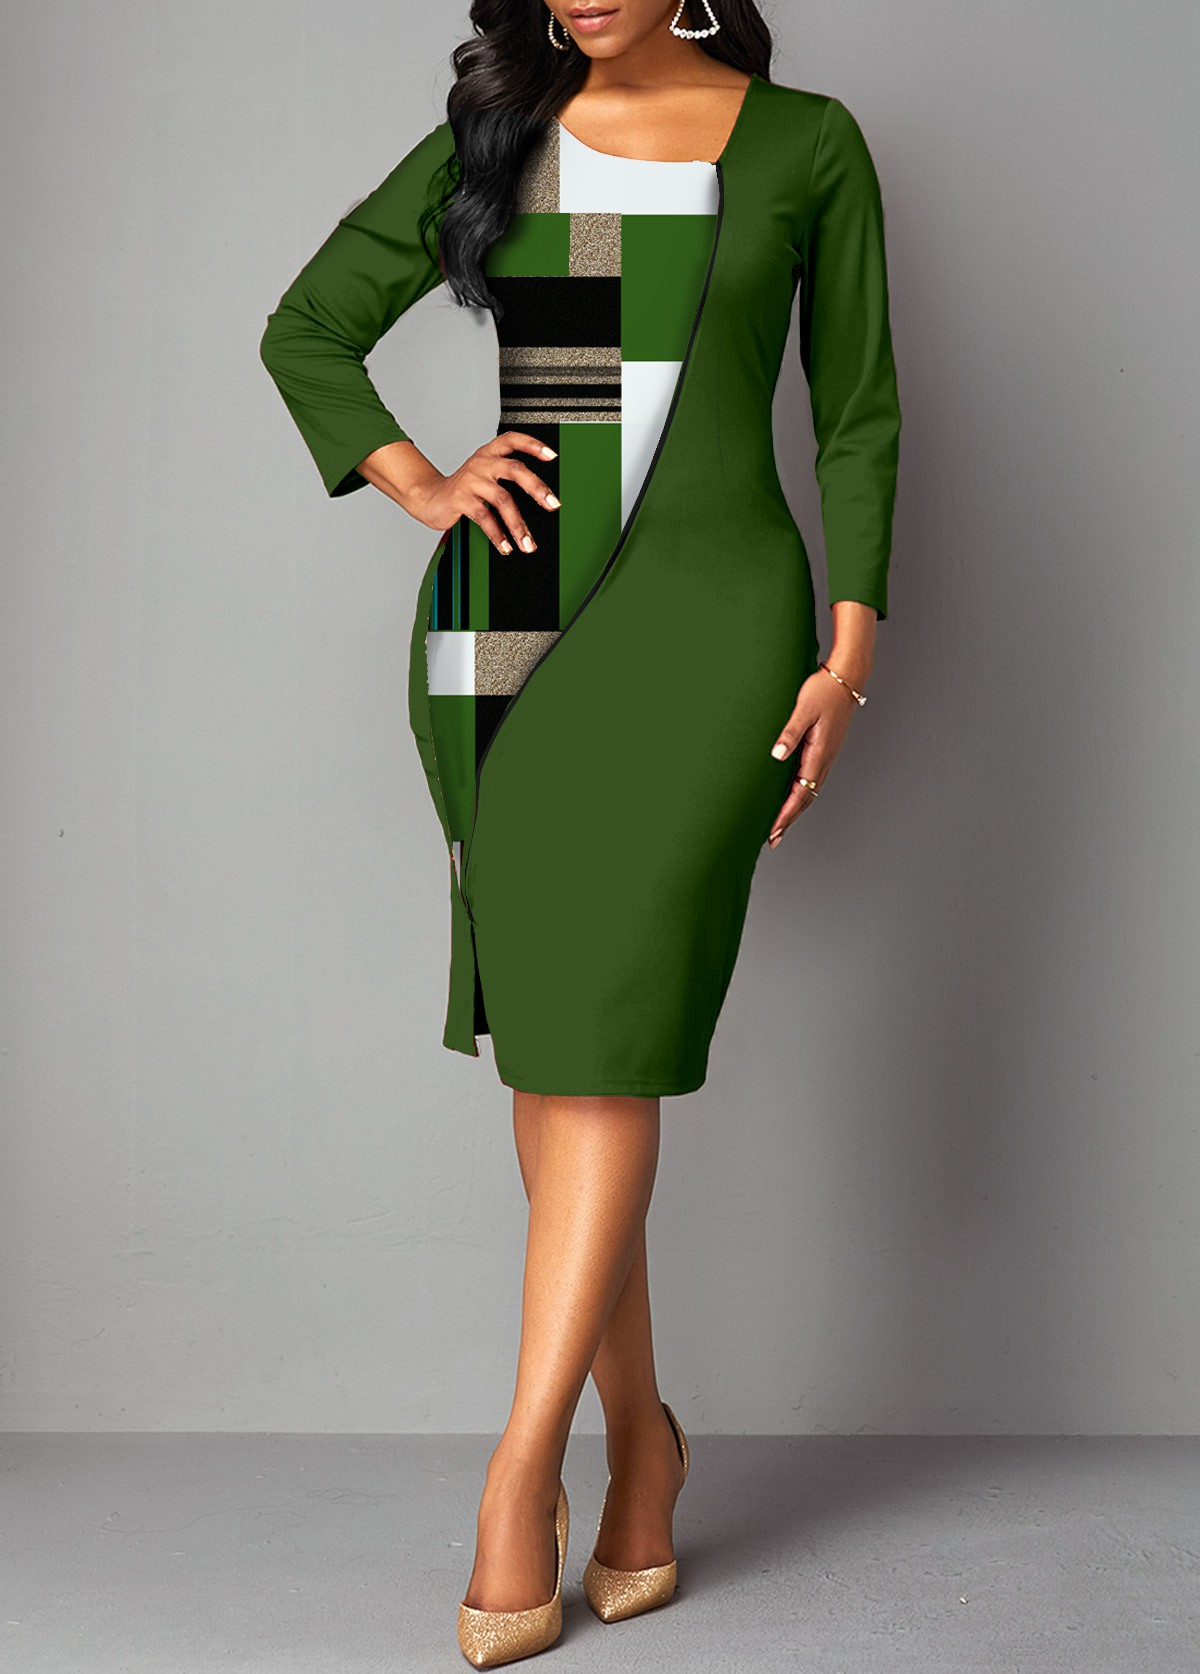 Geometric Print 3/4 Sleeve Bodycon Dress